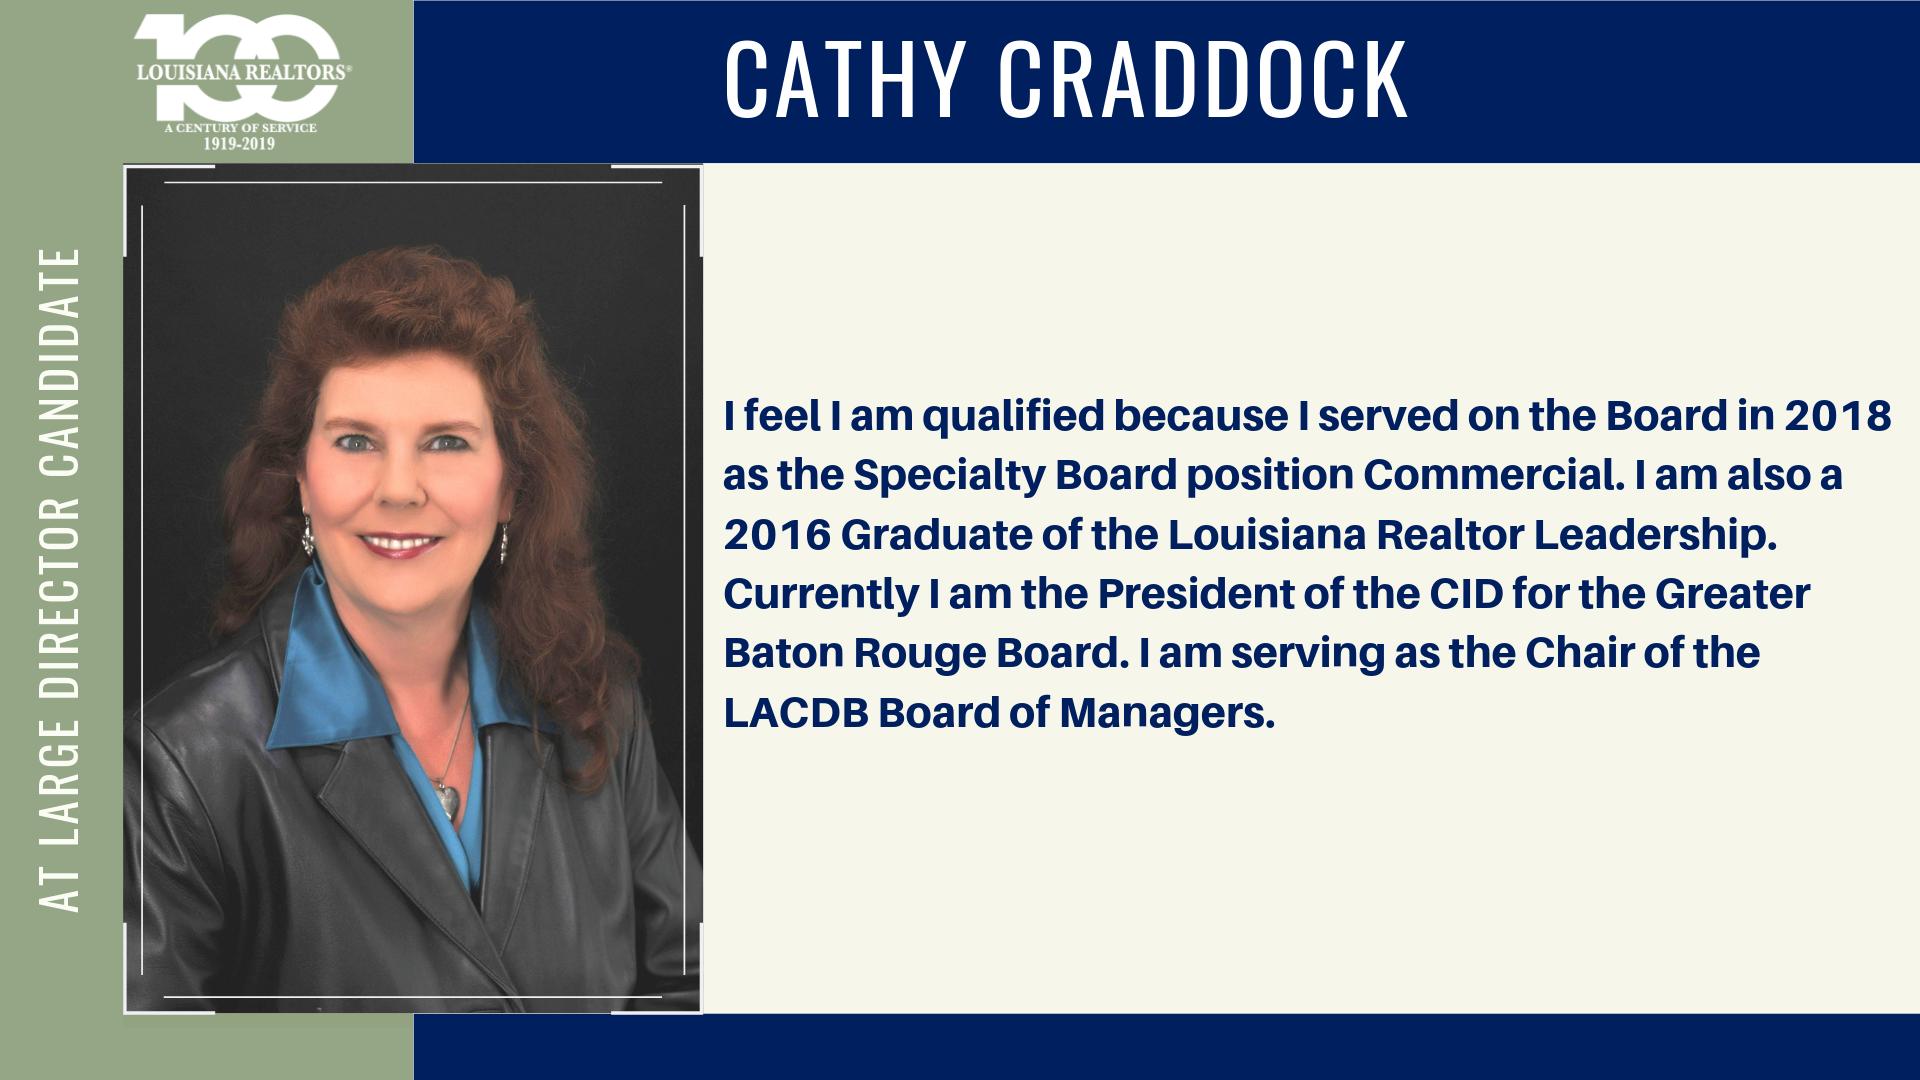 Craddock Cathy.png